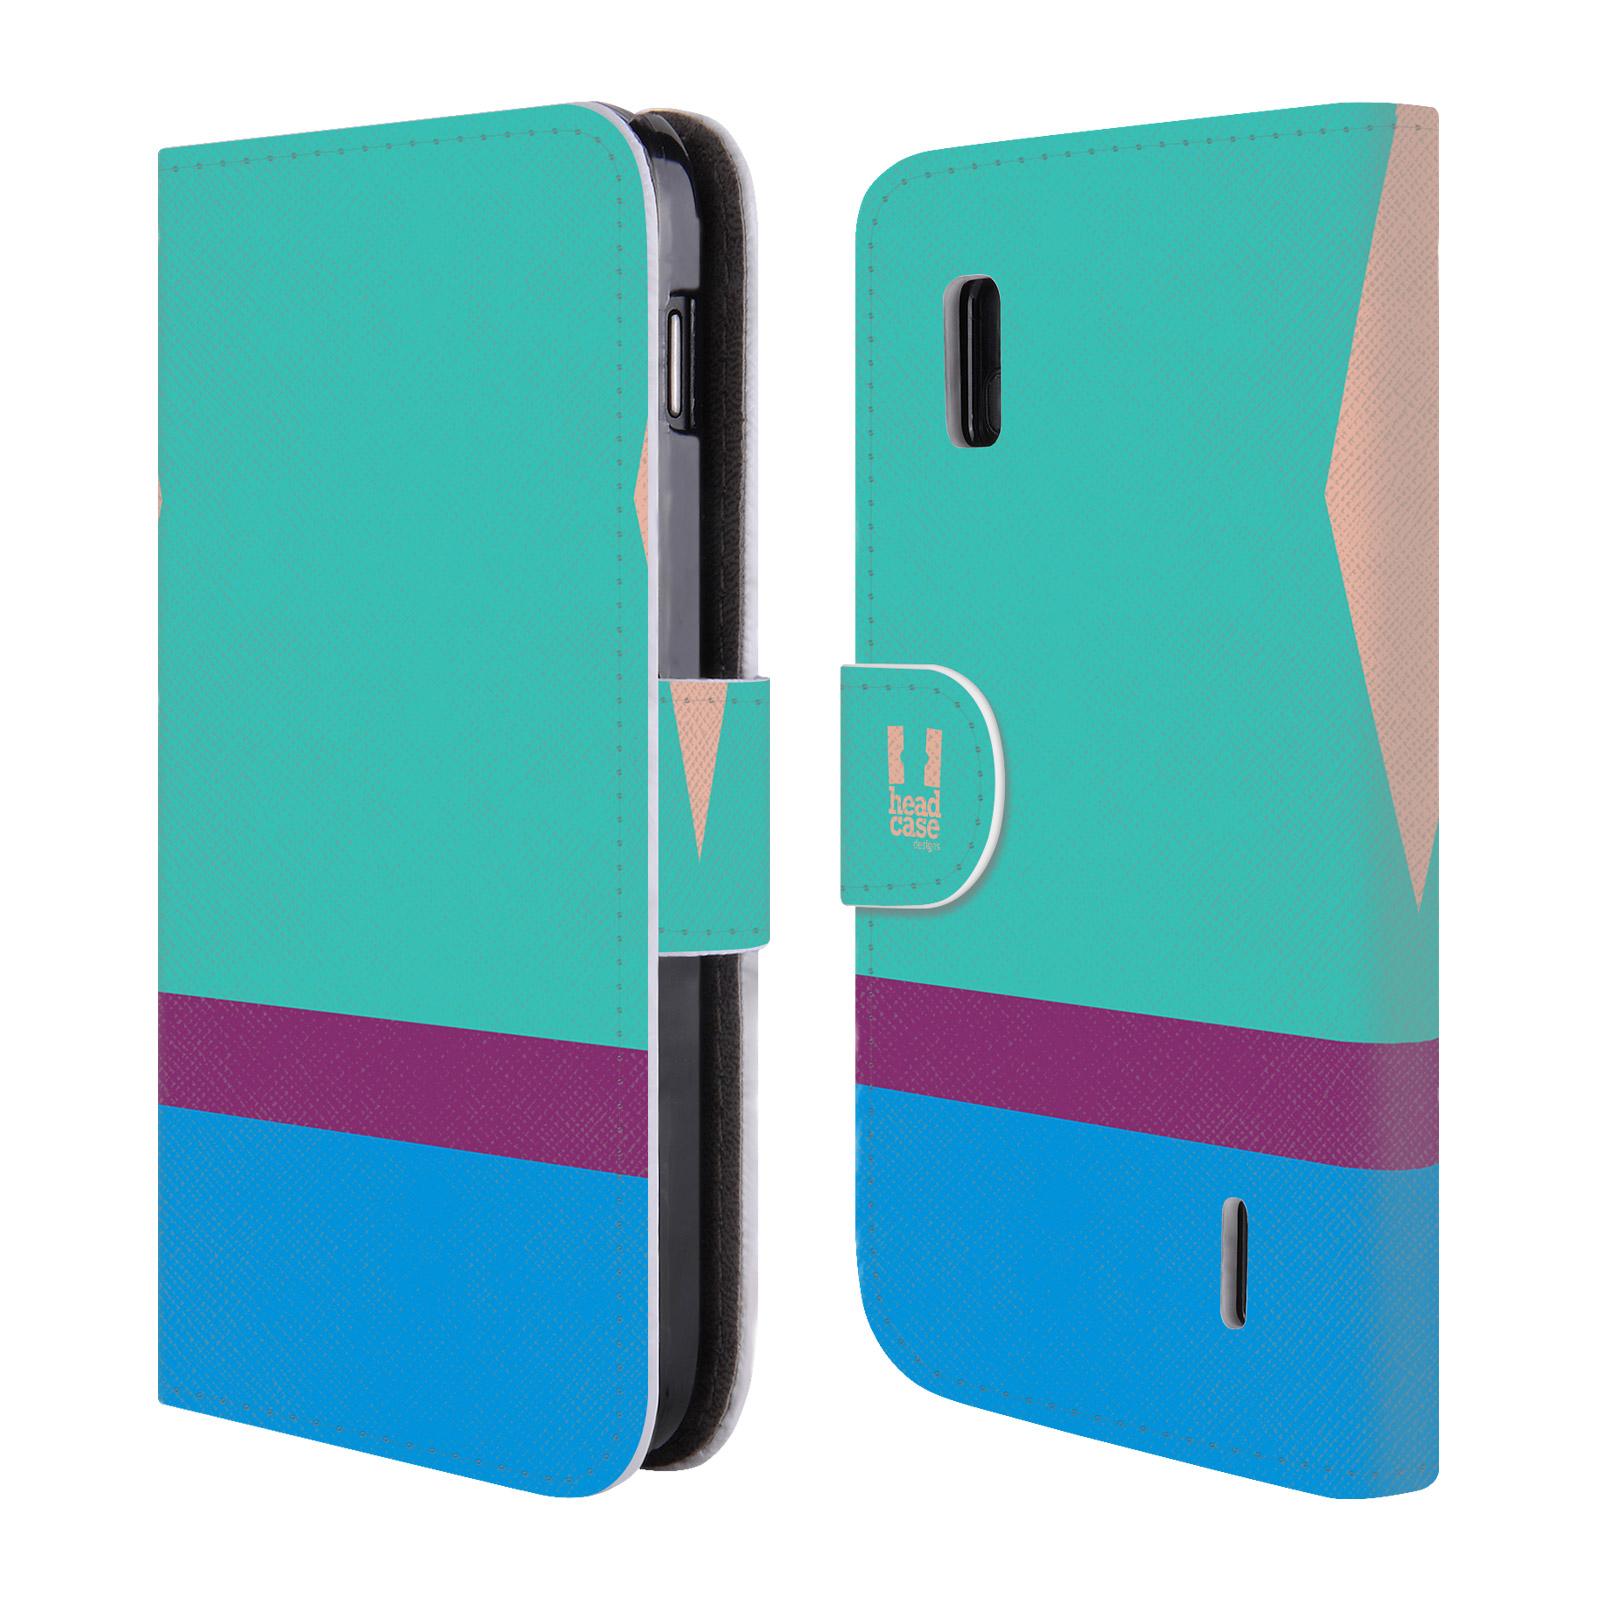 HEAD CASE Flipové pouzdro pro mobil LG NEXUS 4 barevné tvary modrá a fialový pruh